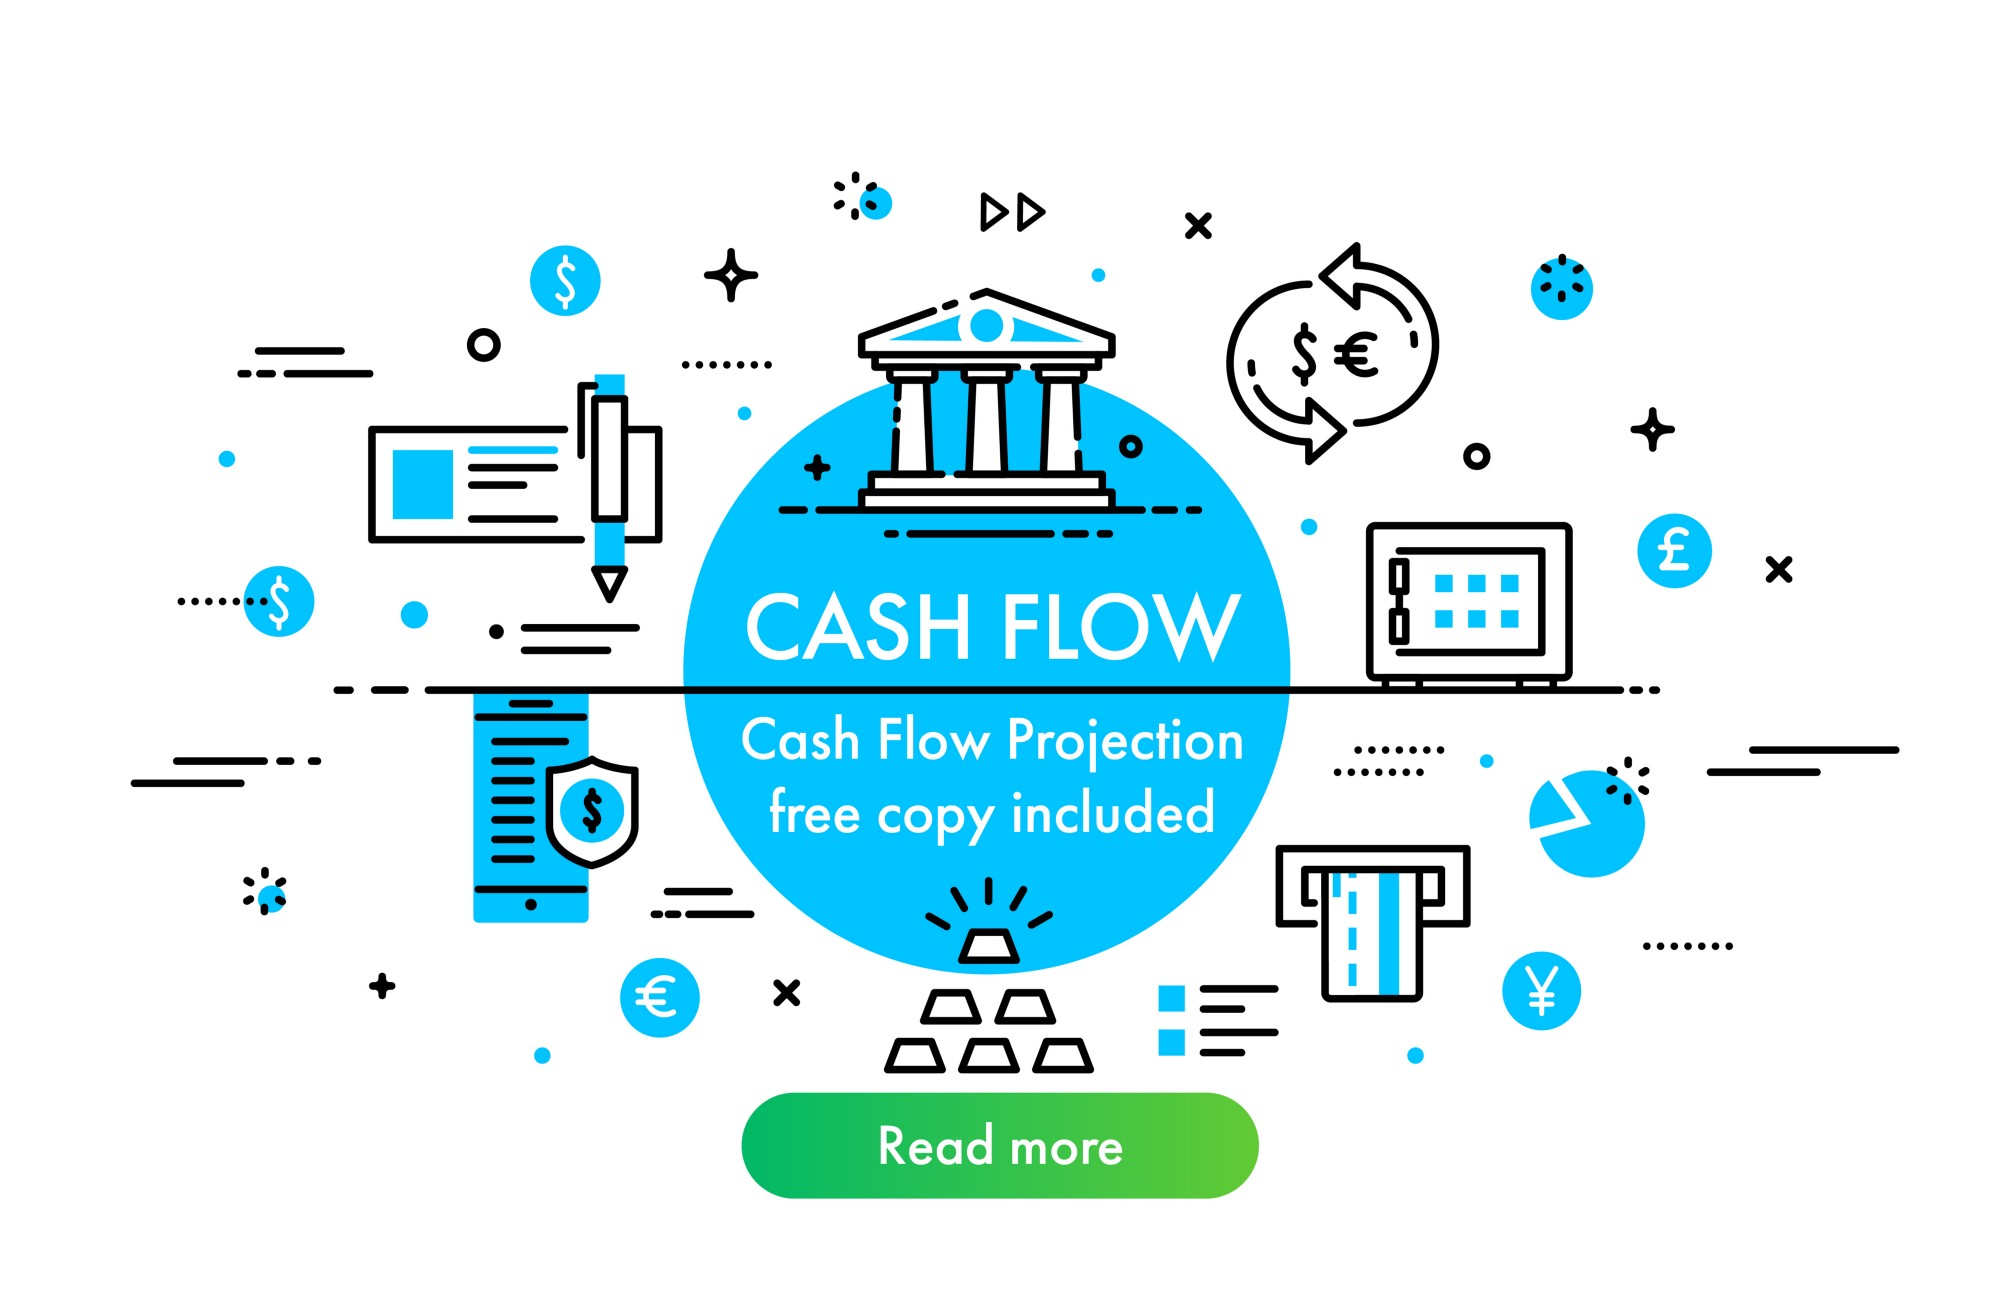 Cash Flow Projection Template Included Henry Sheykin